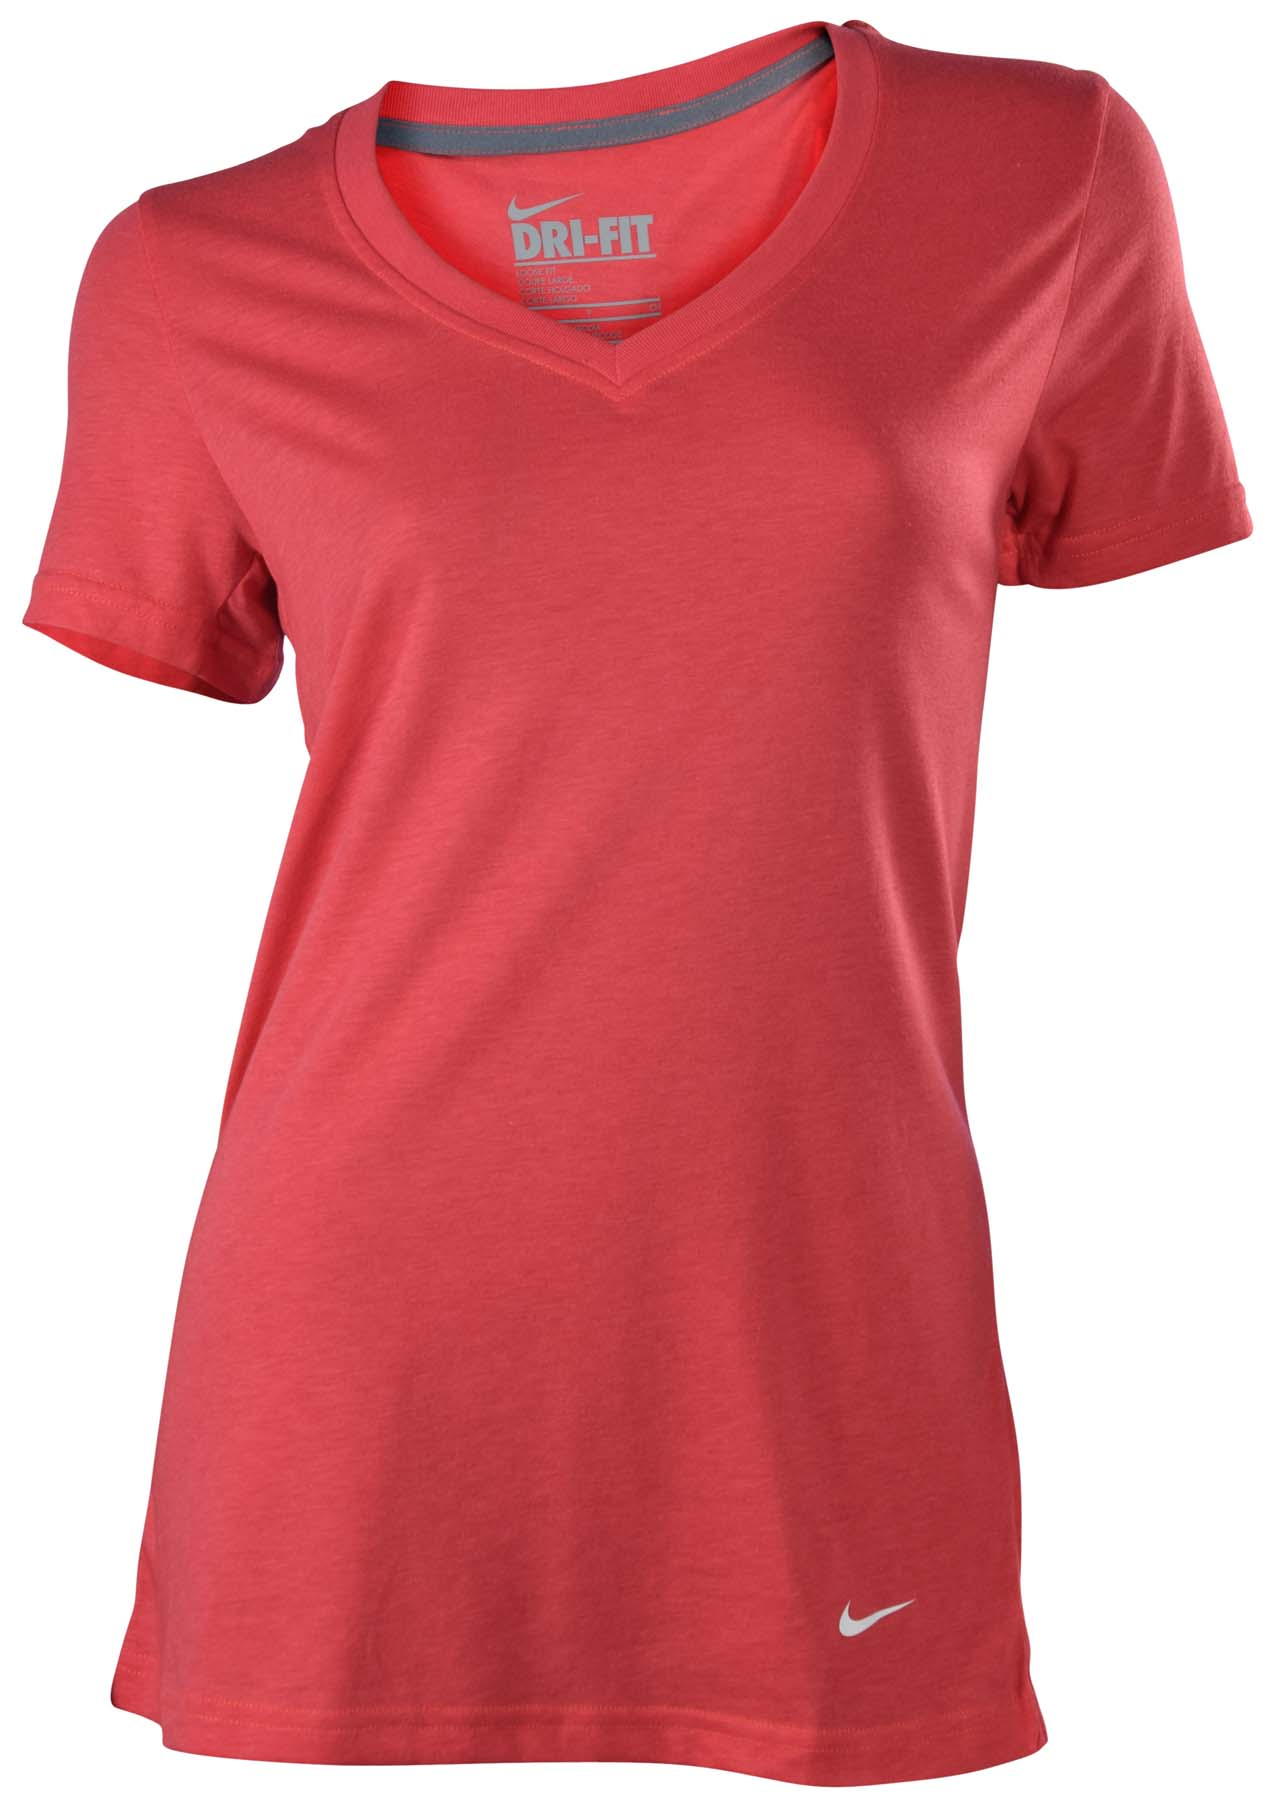 Nike women 39 s dri fit v neck training t shirt ebay for Nike dri fit t shirt ladies